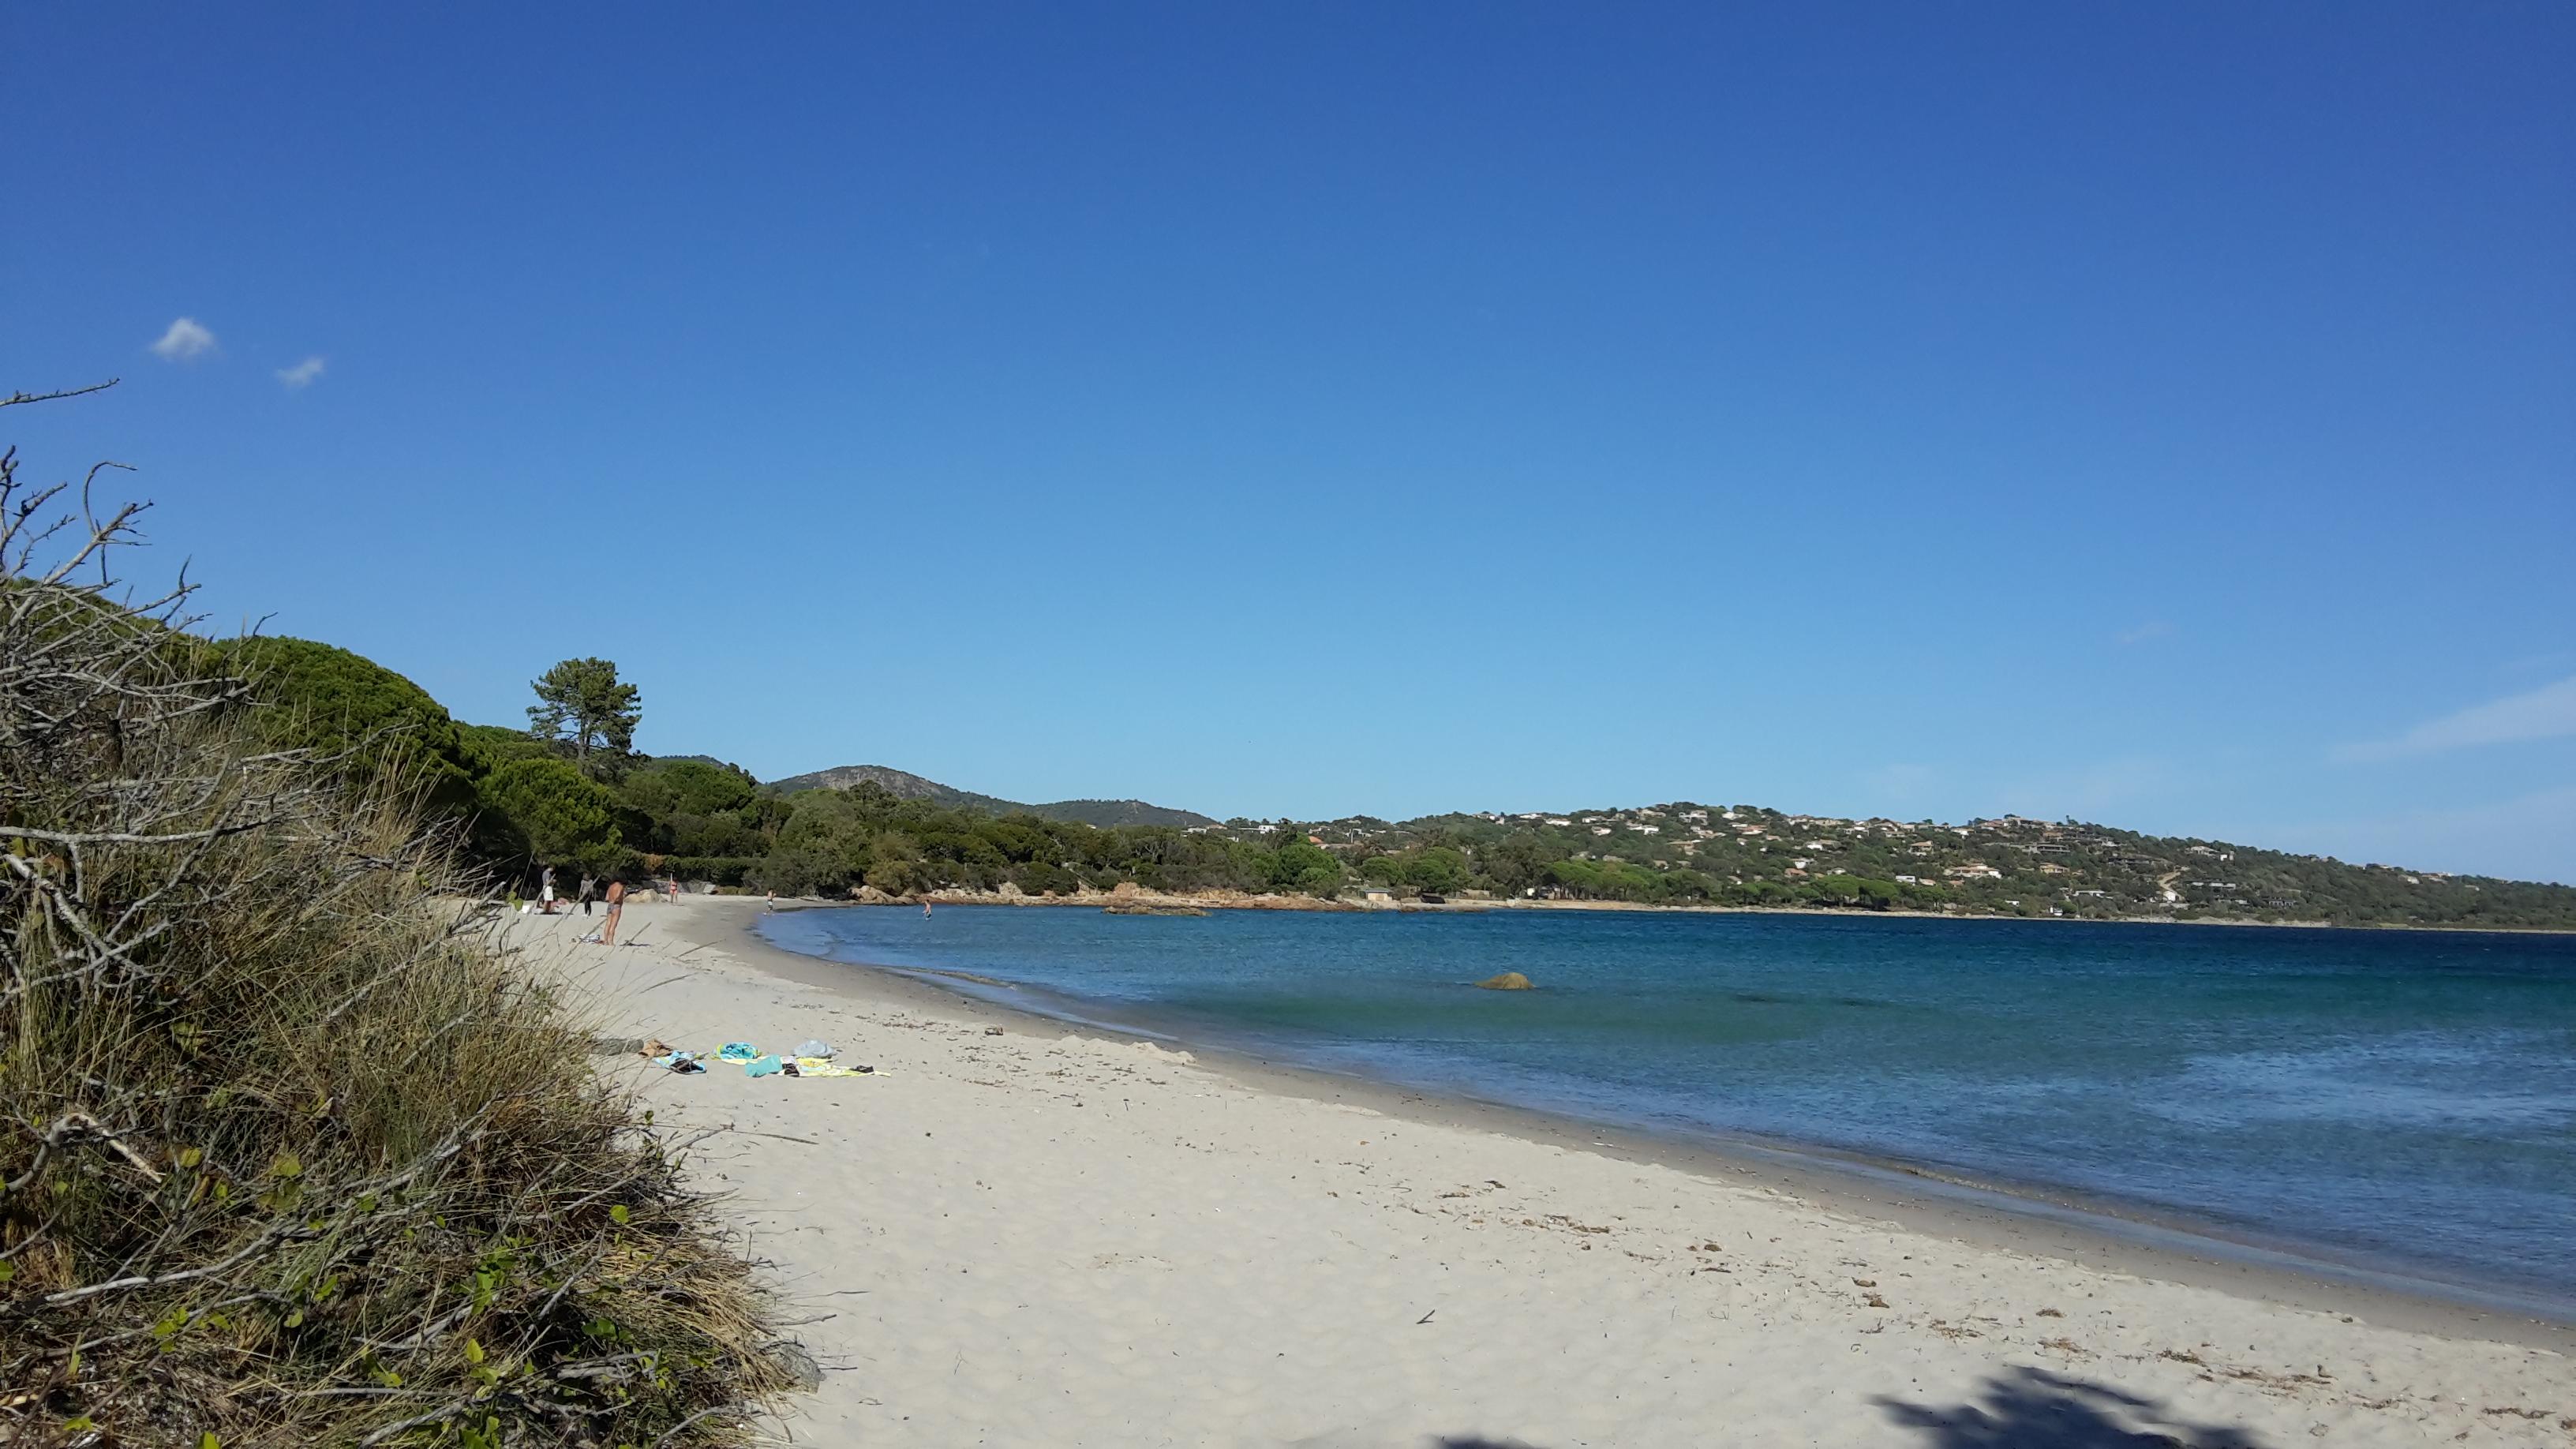 Süd Korsika, Ferienhaus mieten, Pool